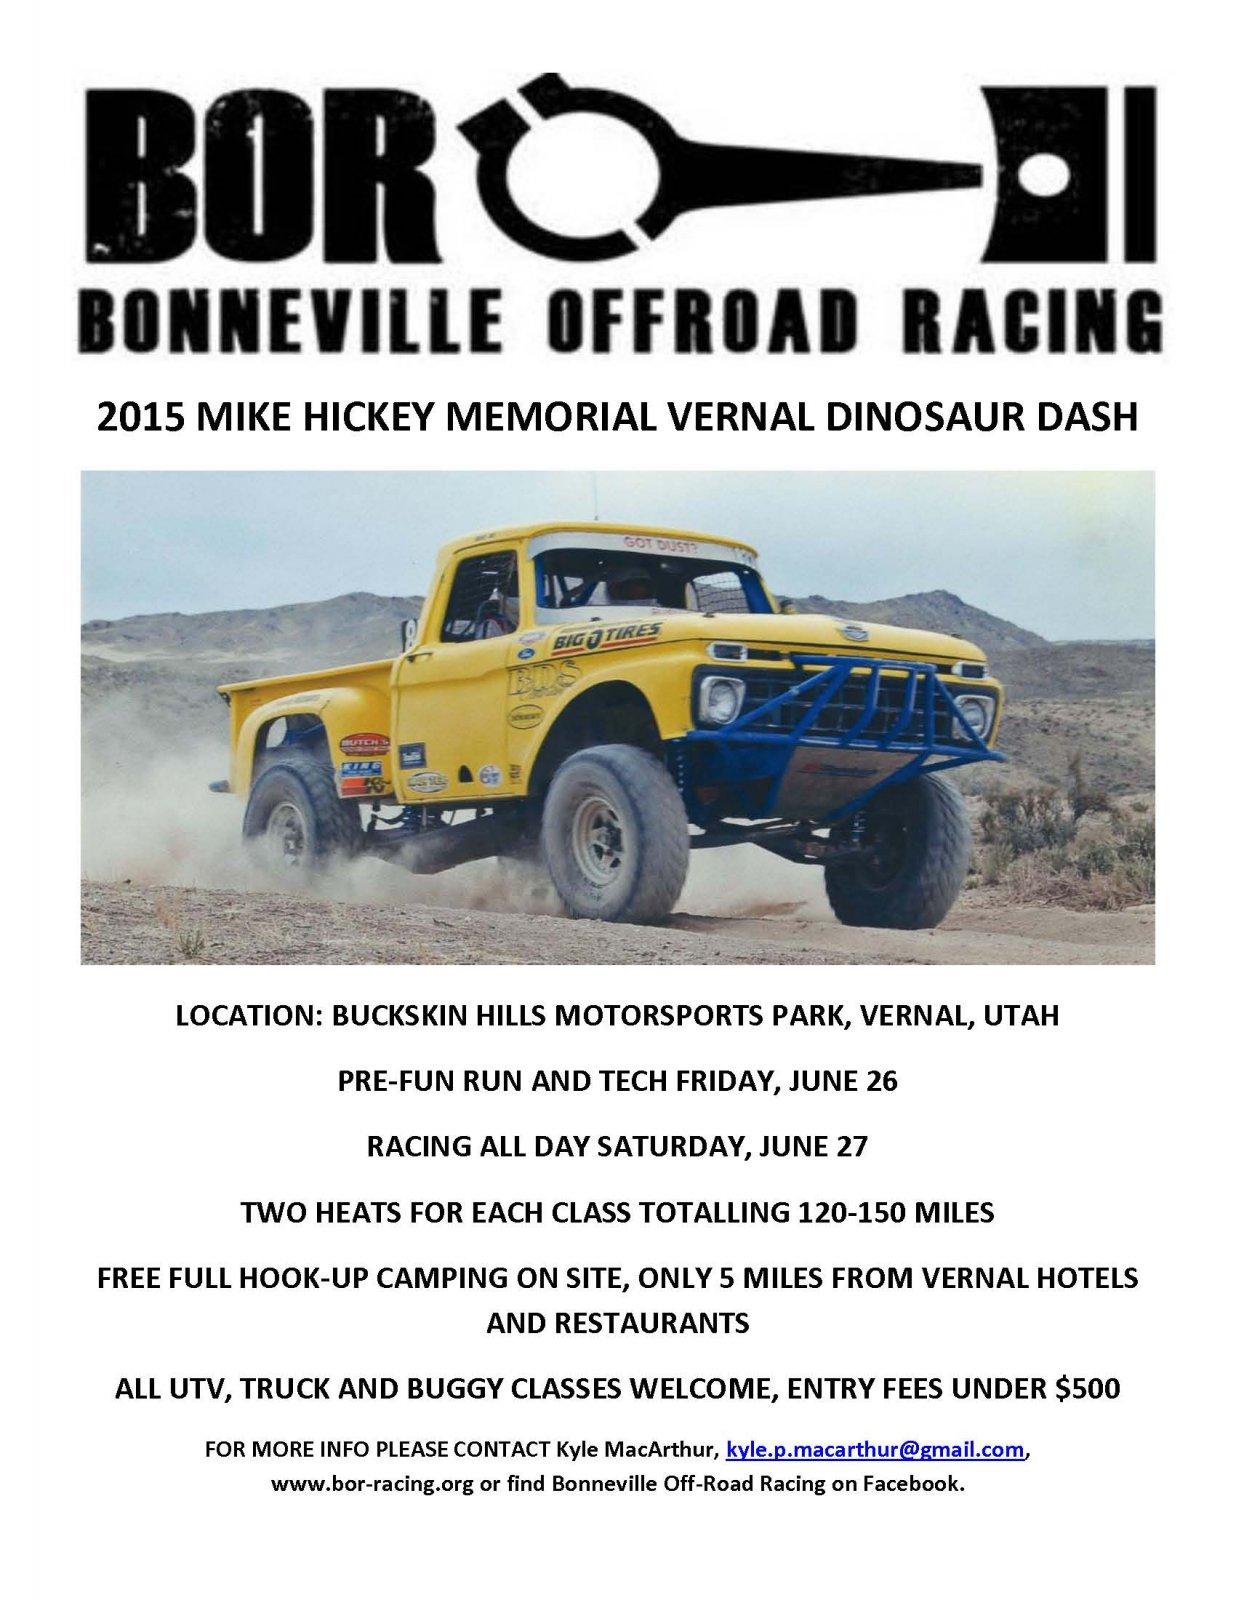 2015 MIKE HICKEY MEMORIAL VERNAL DINOSAUR DASH flyer.jpg